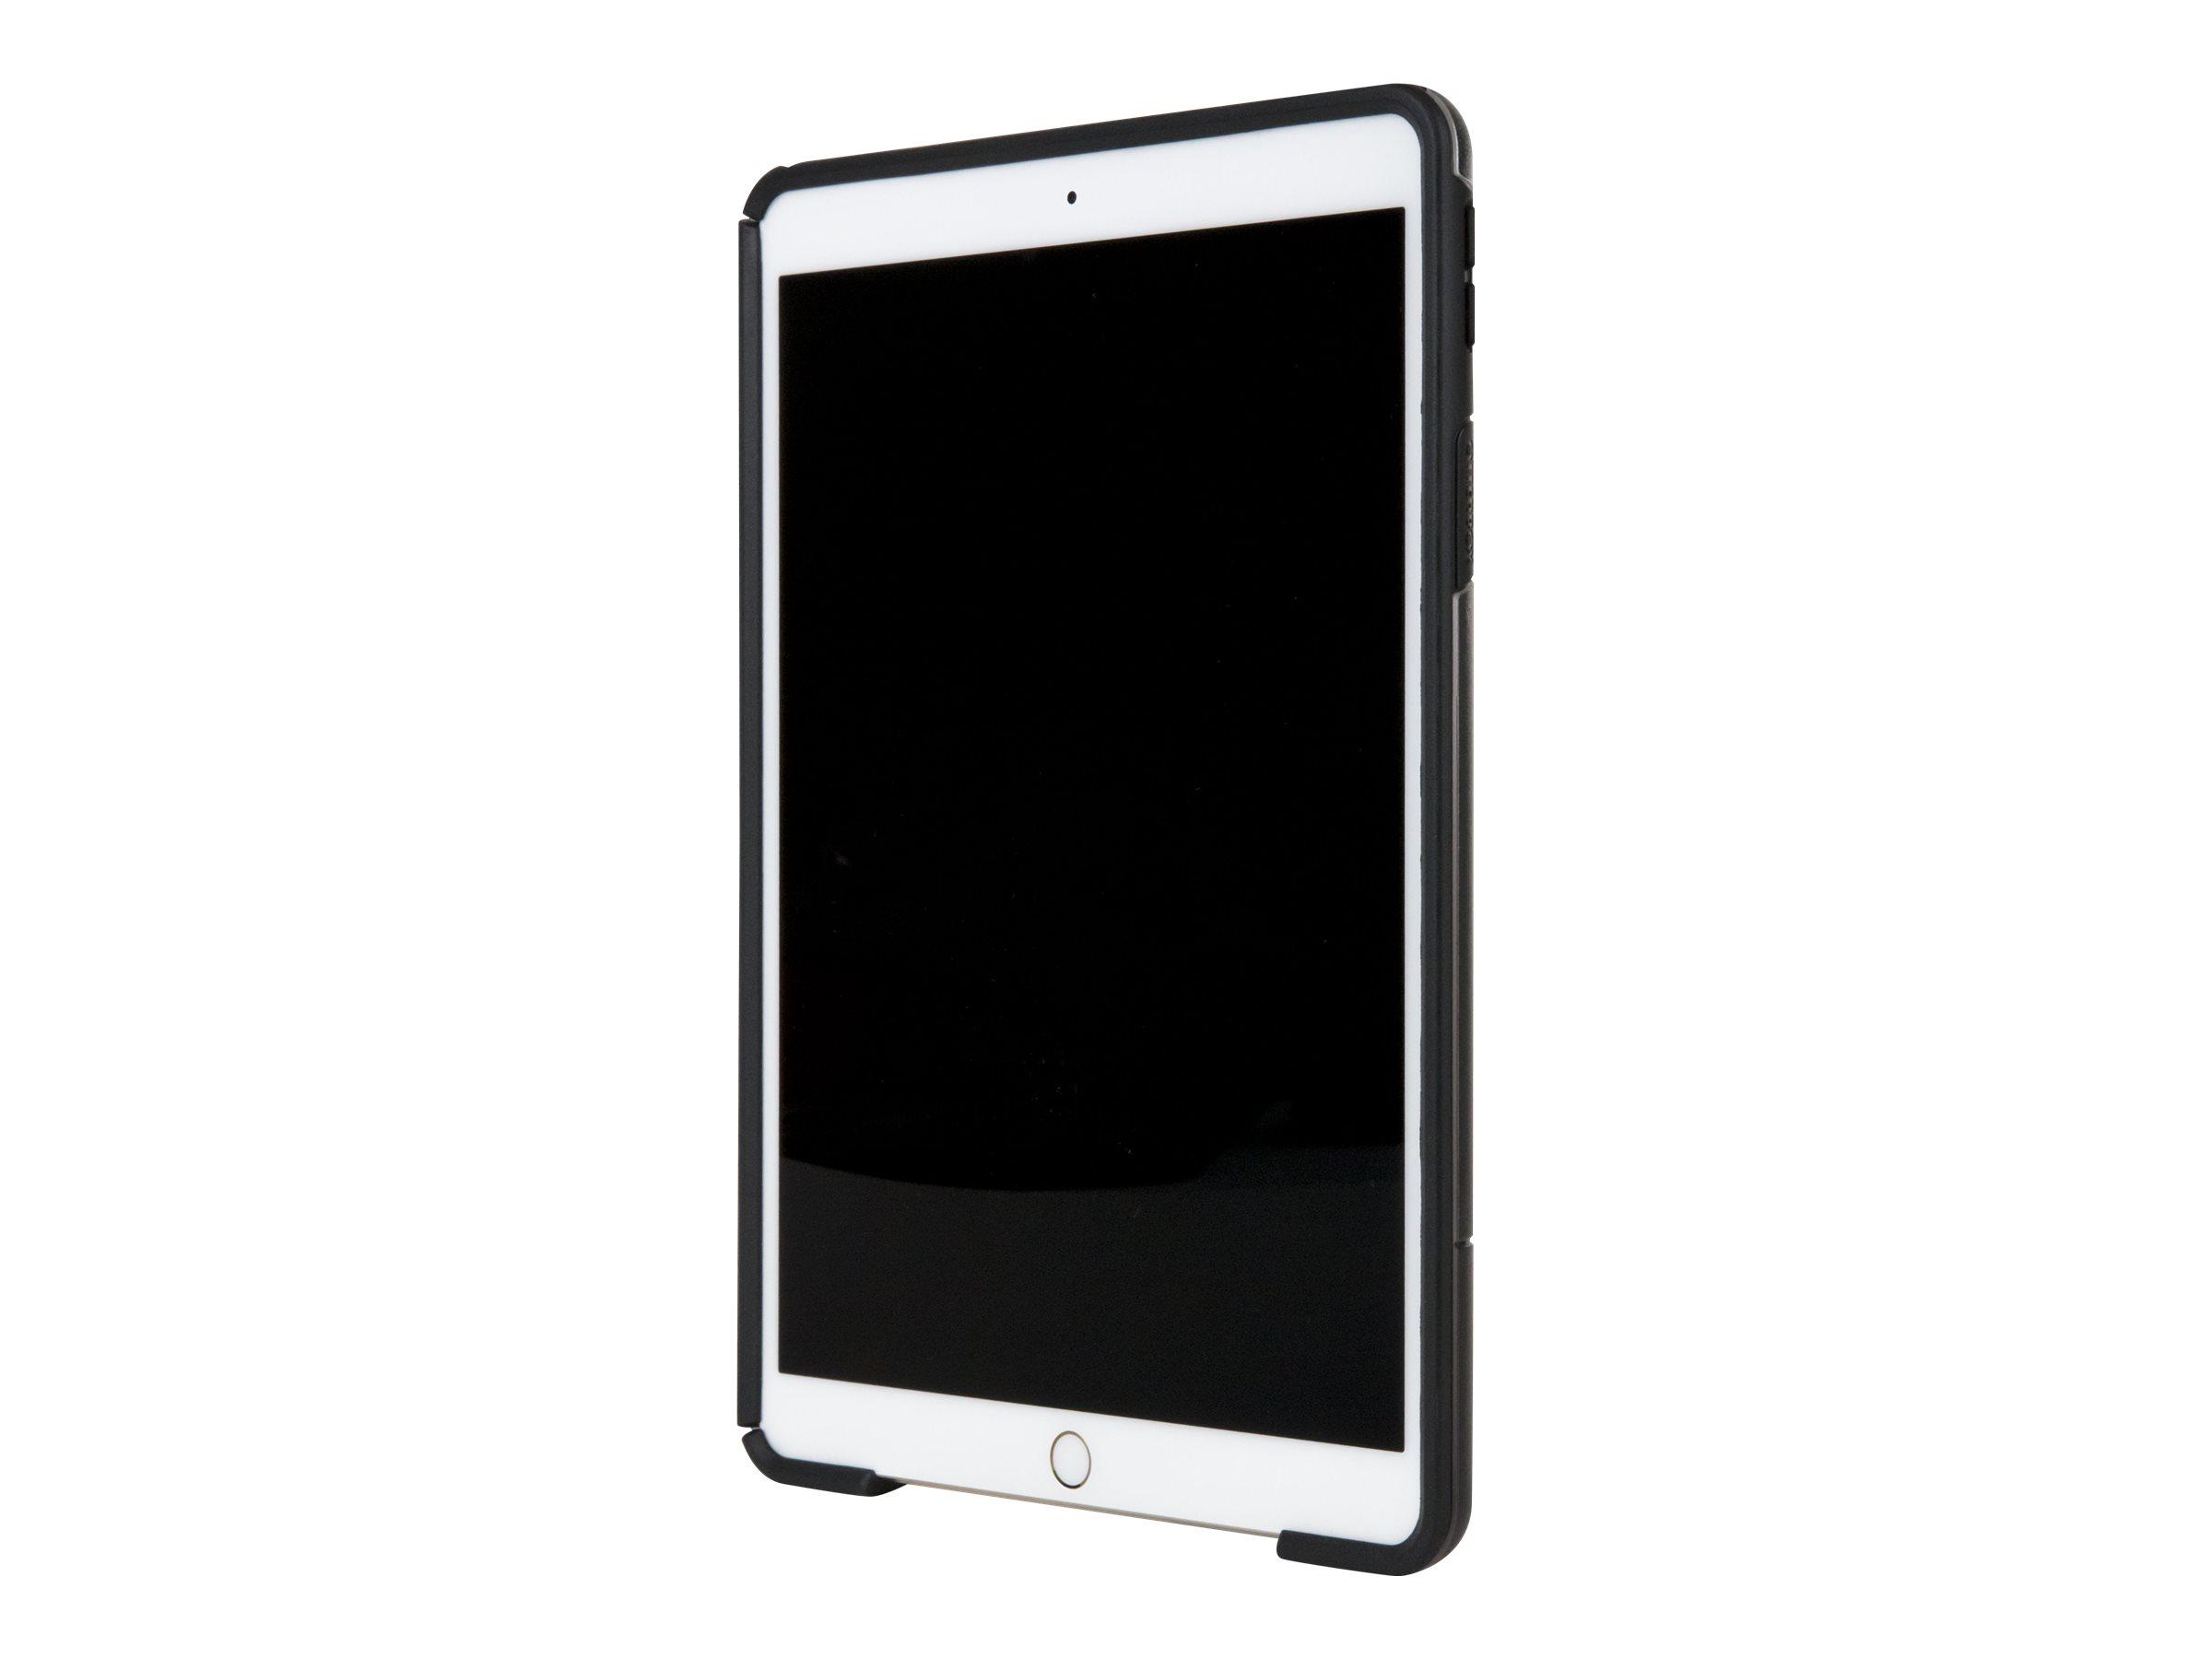 OtterBox uniVERSE for Apple iPad Pro 10.5-inch - Pro Pack - hintere Abdeckung für Mobiltelefon - Polycarbonat - Schwarz, klar -